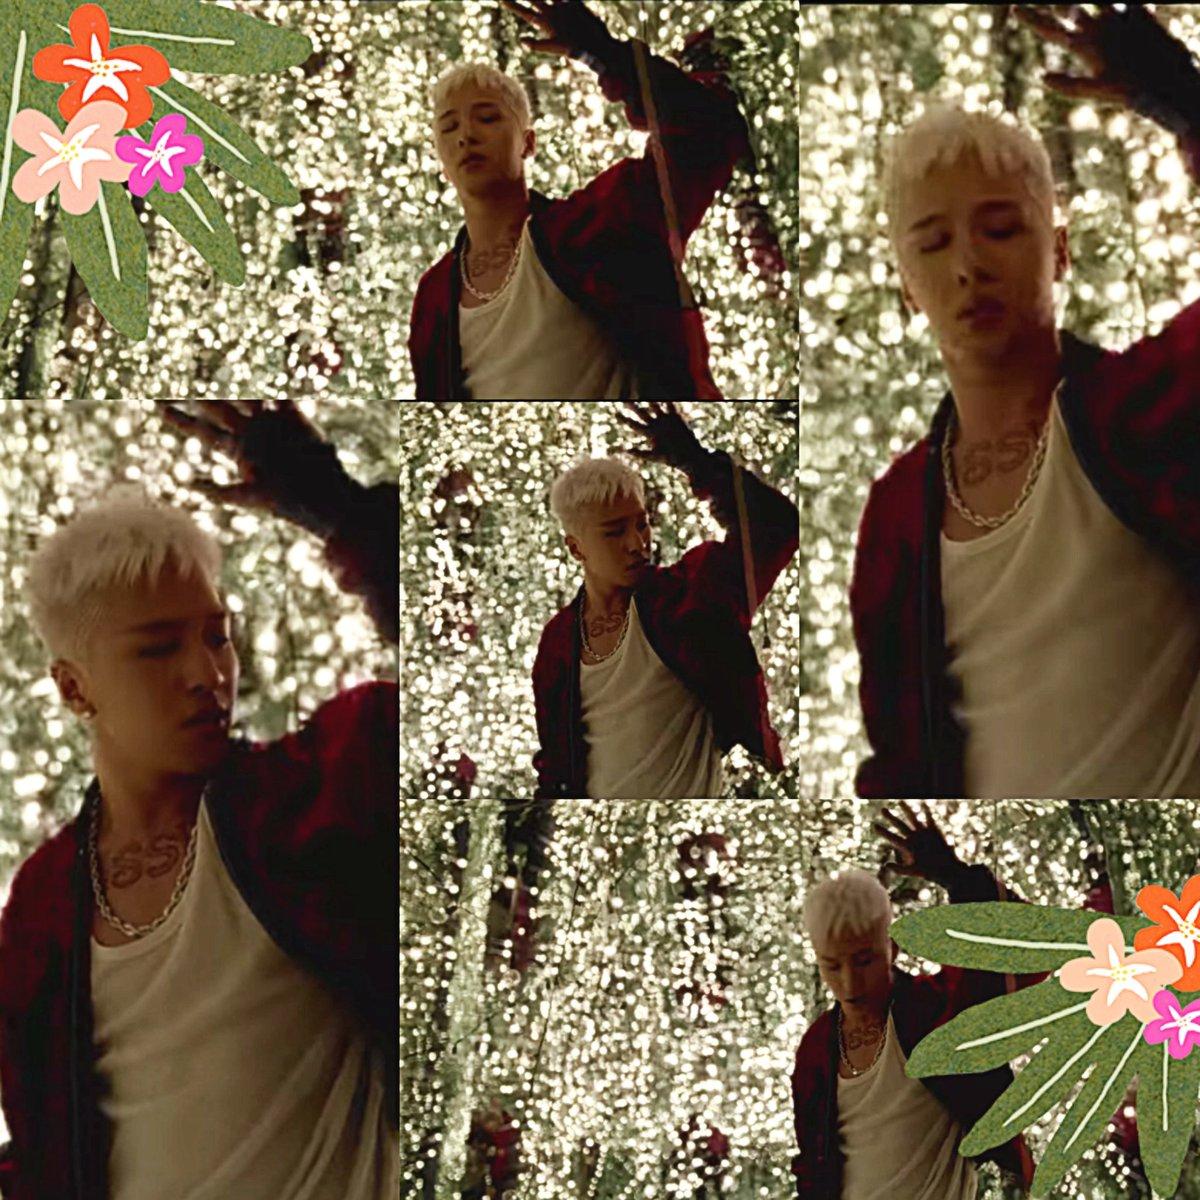 When he looks so #sweet16 and singin&#39; so grownup songsss ... mommy go flippin&#39;  #proudofmyson #whitenightTaeyang<br>http://pic.twitter.com/vHPeJP5QjB